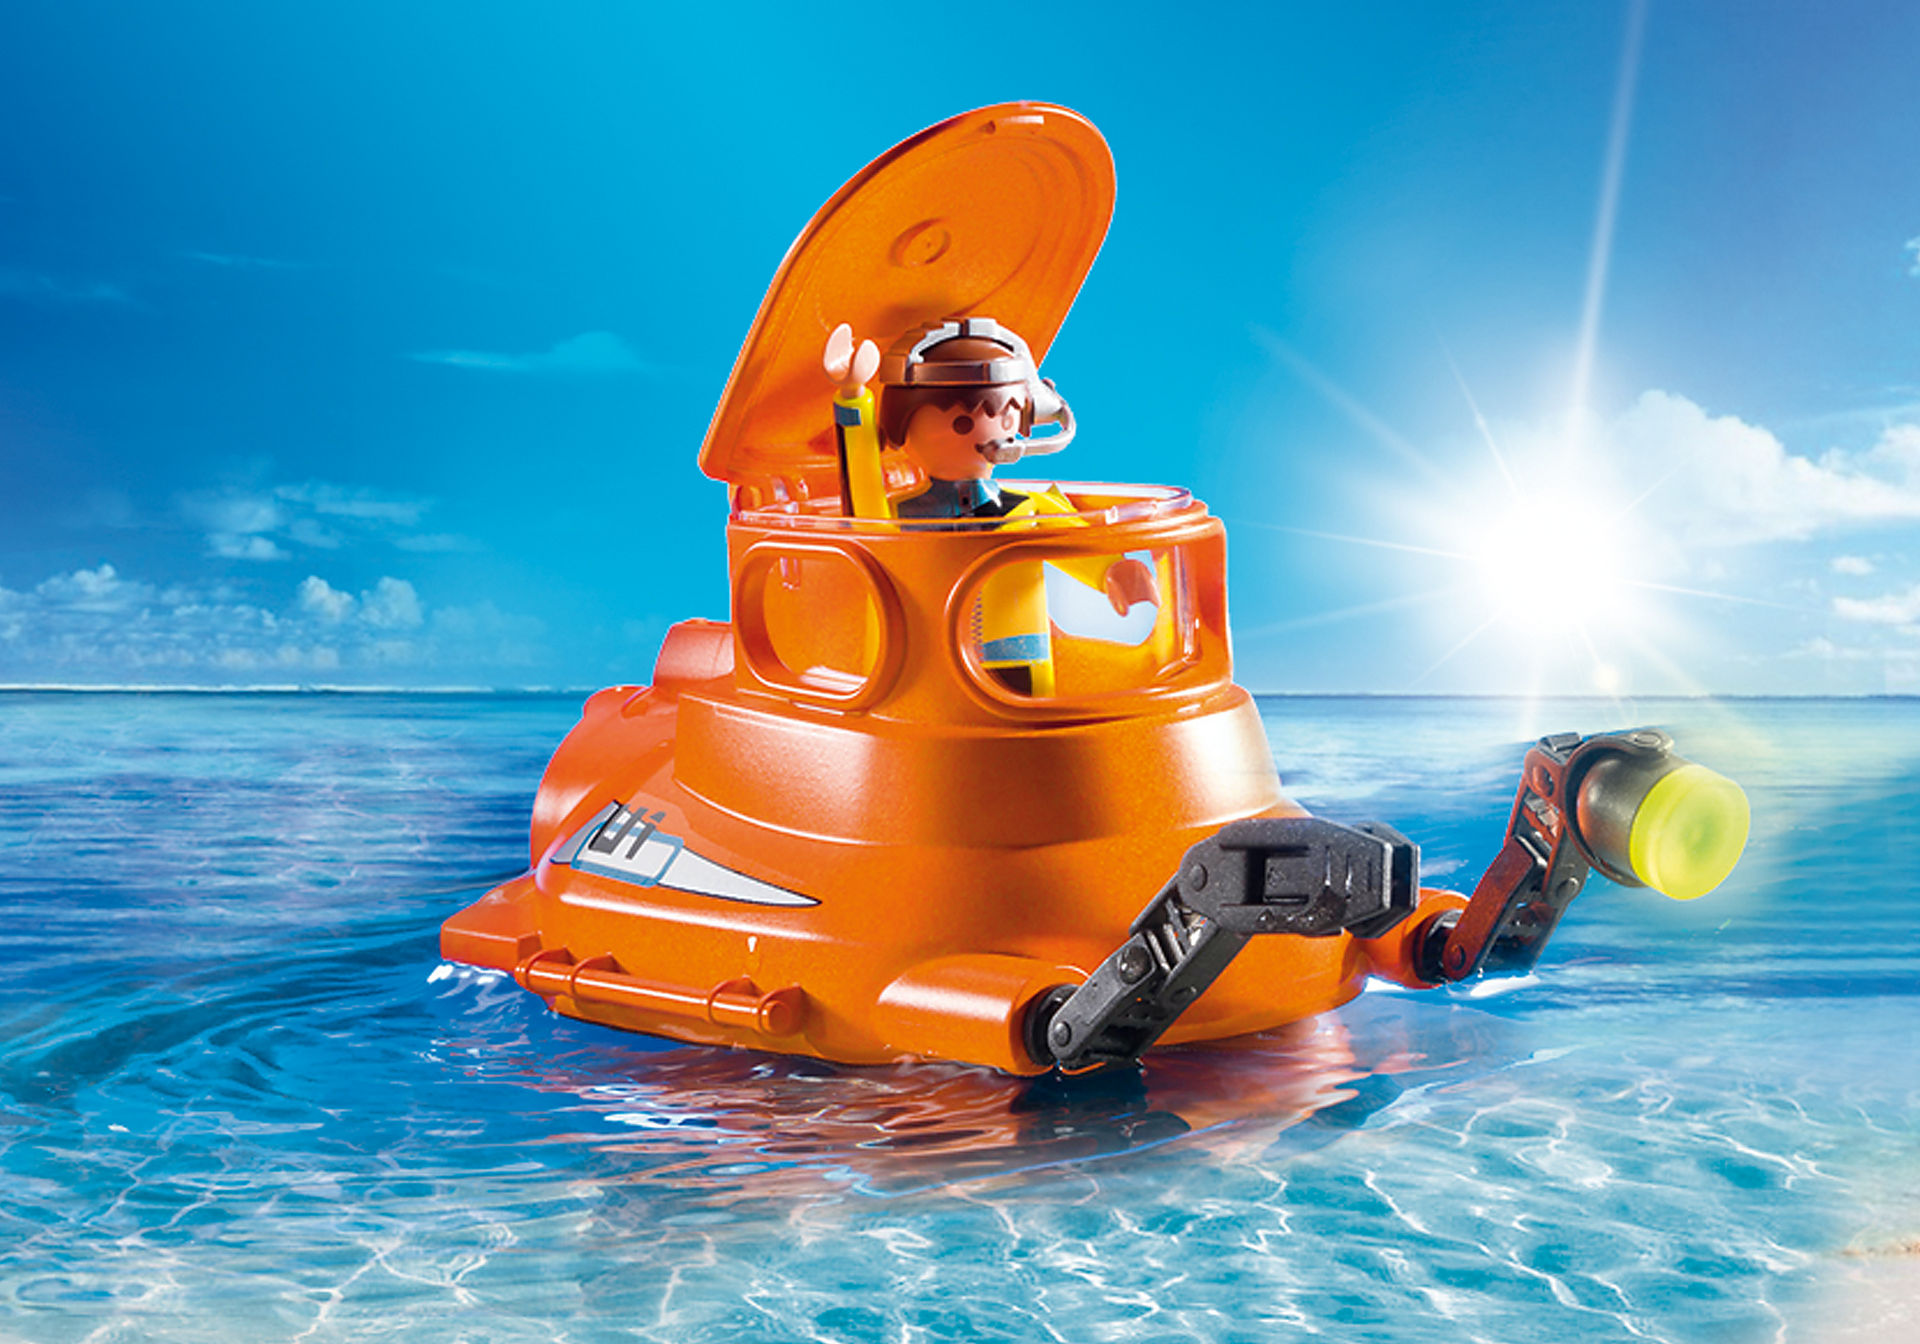 http://media.playmobil.com/i/playmobil/9234_product_extra2/Cloche de plongée avec moteur submersible